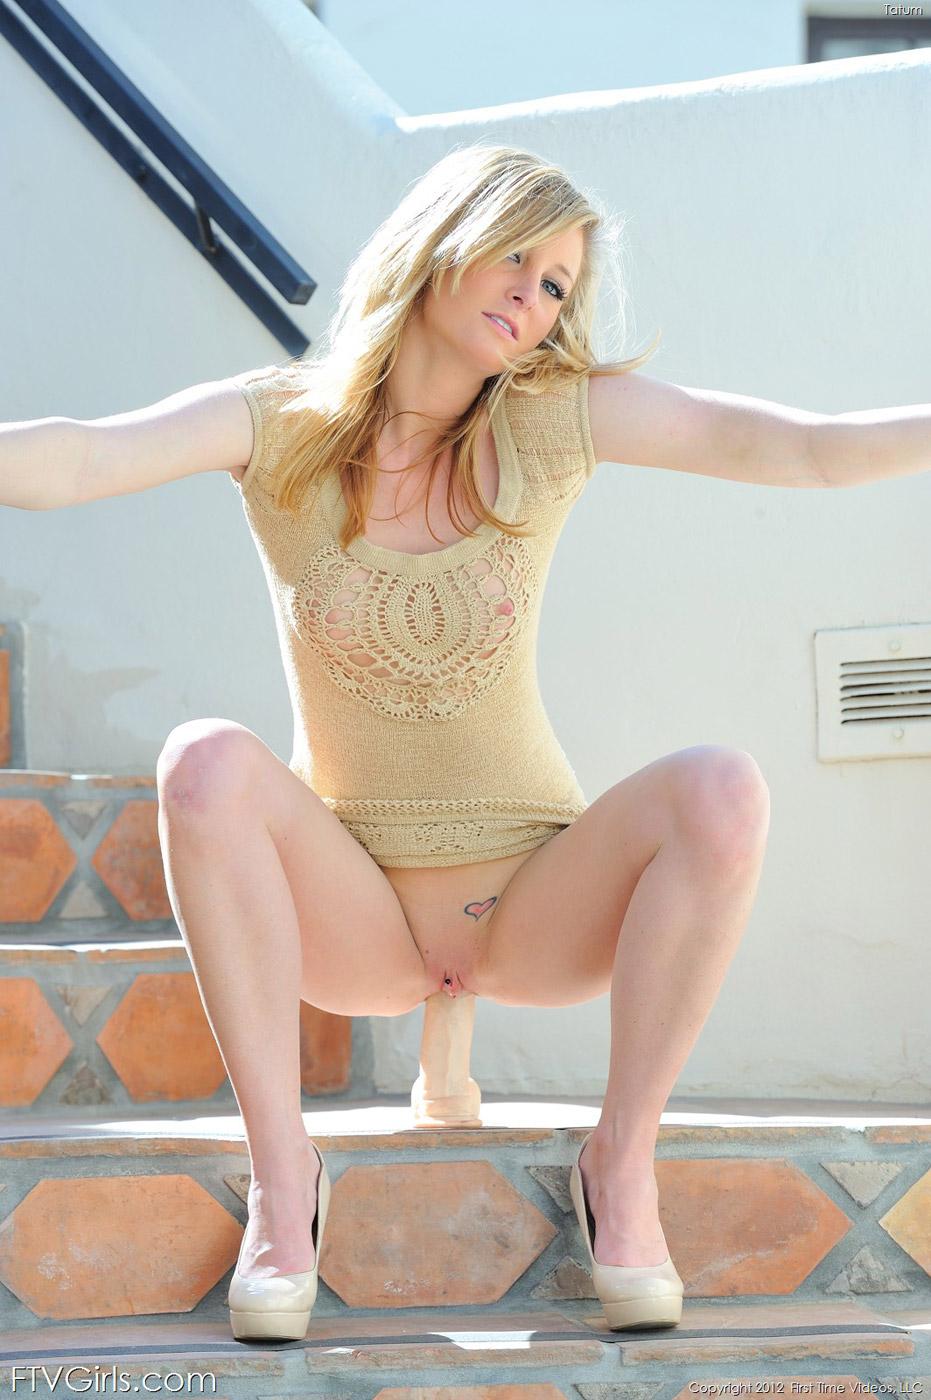 05 68 - Słodka blondi